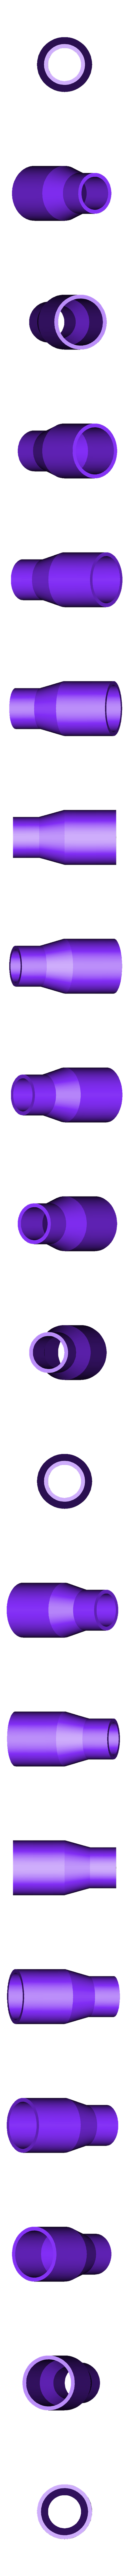 "makita_sander_1.25in_dust_adapter.stl Download free STL file Makita BO5041 sander to 1.25"" hose adapter • 3D printing model, Makerneer"